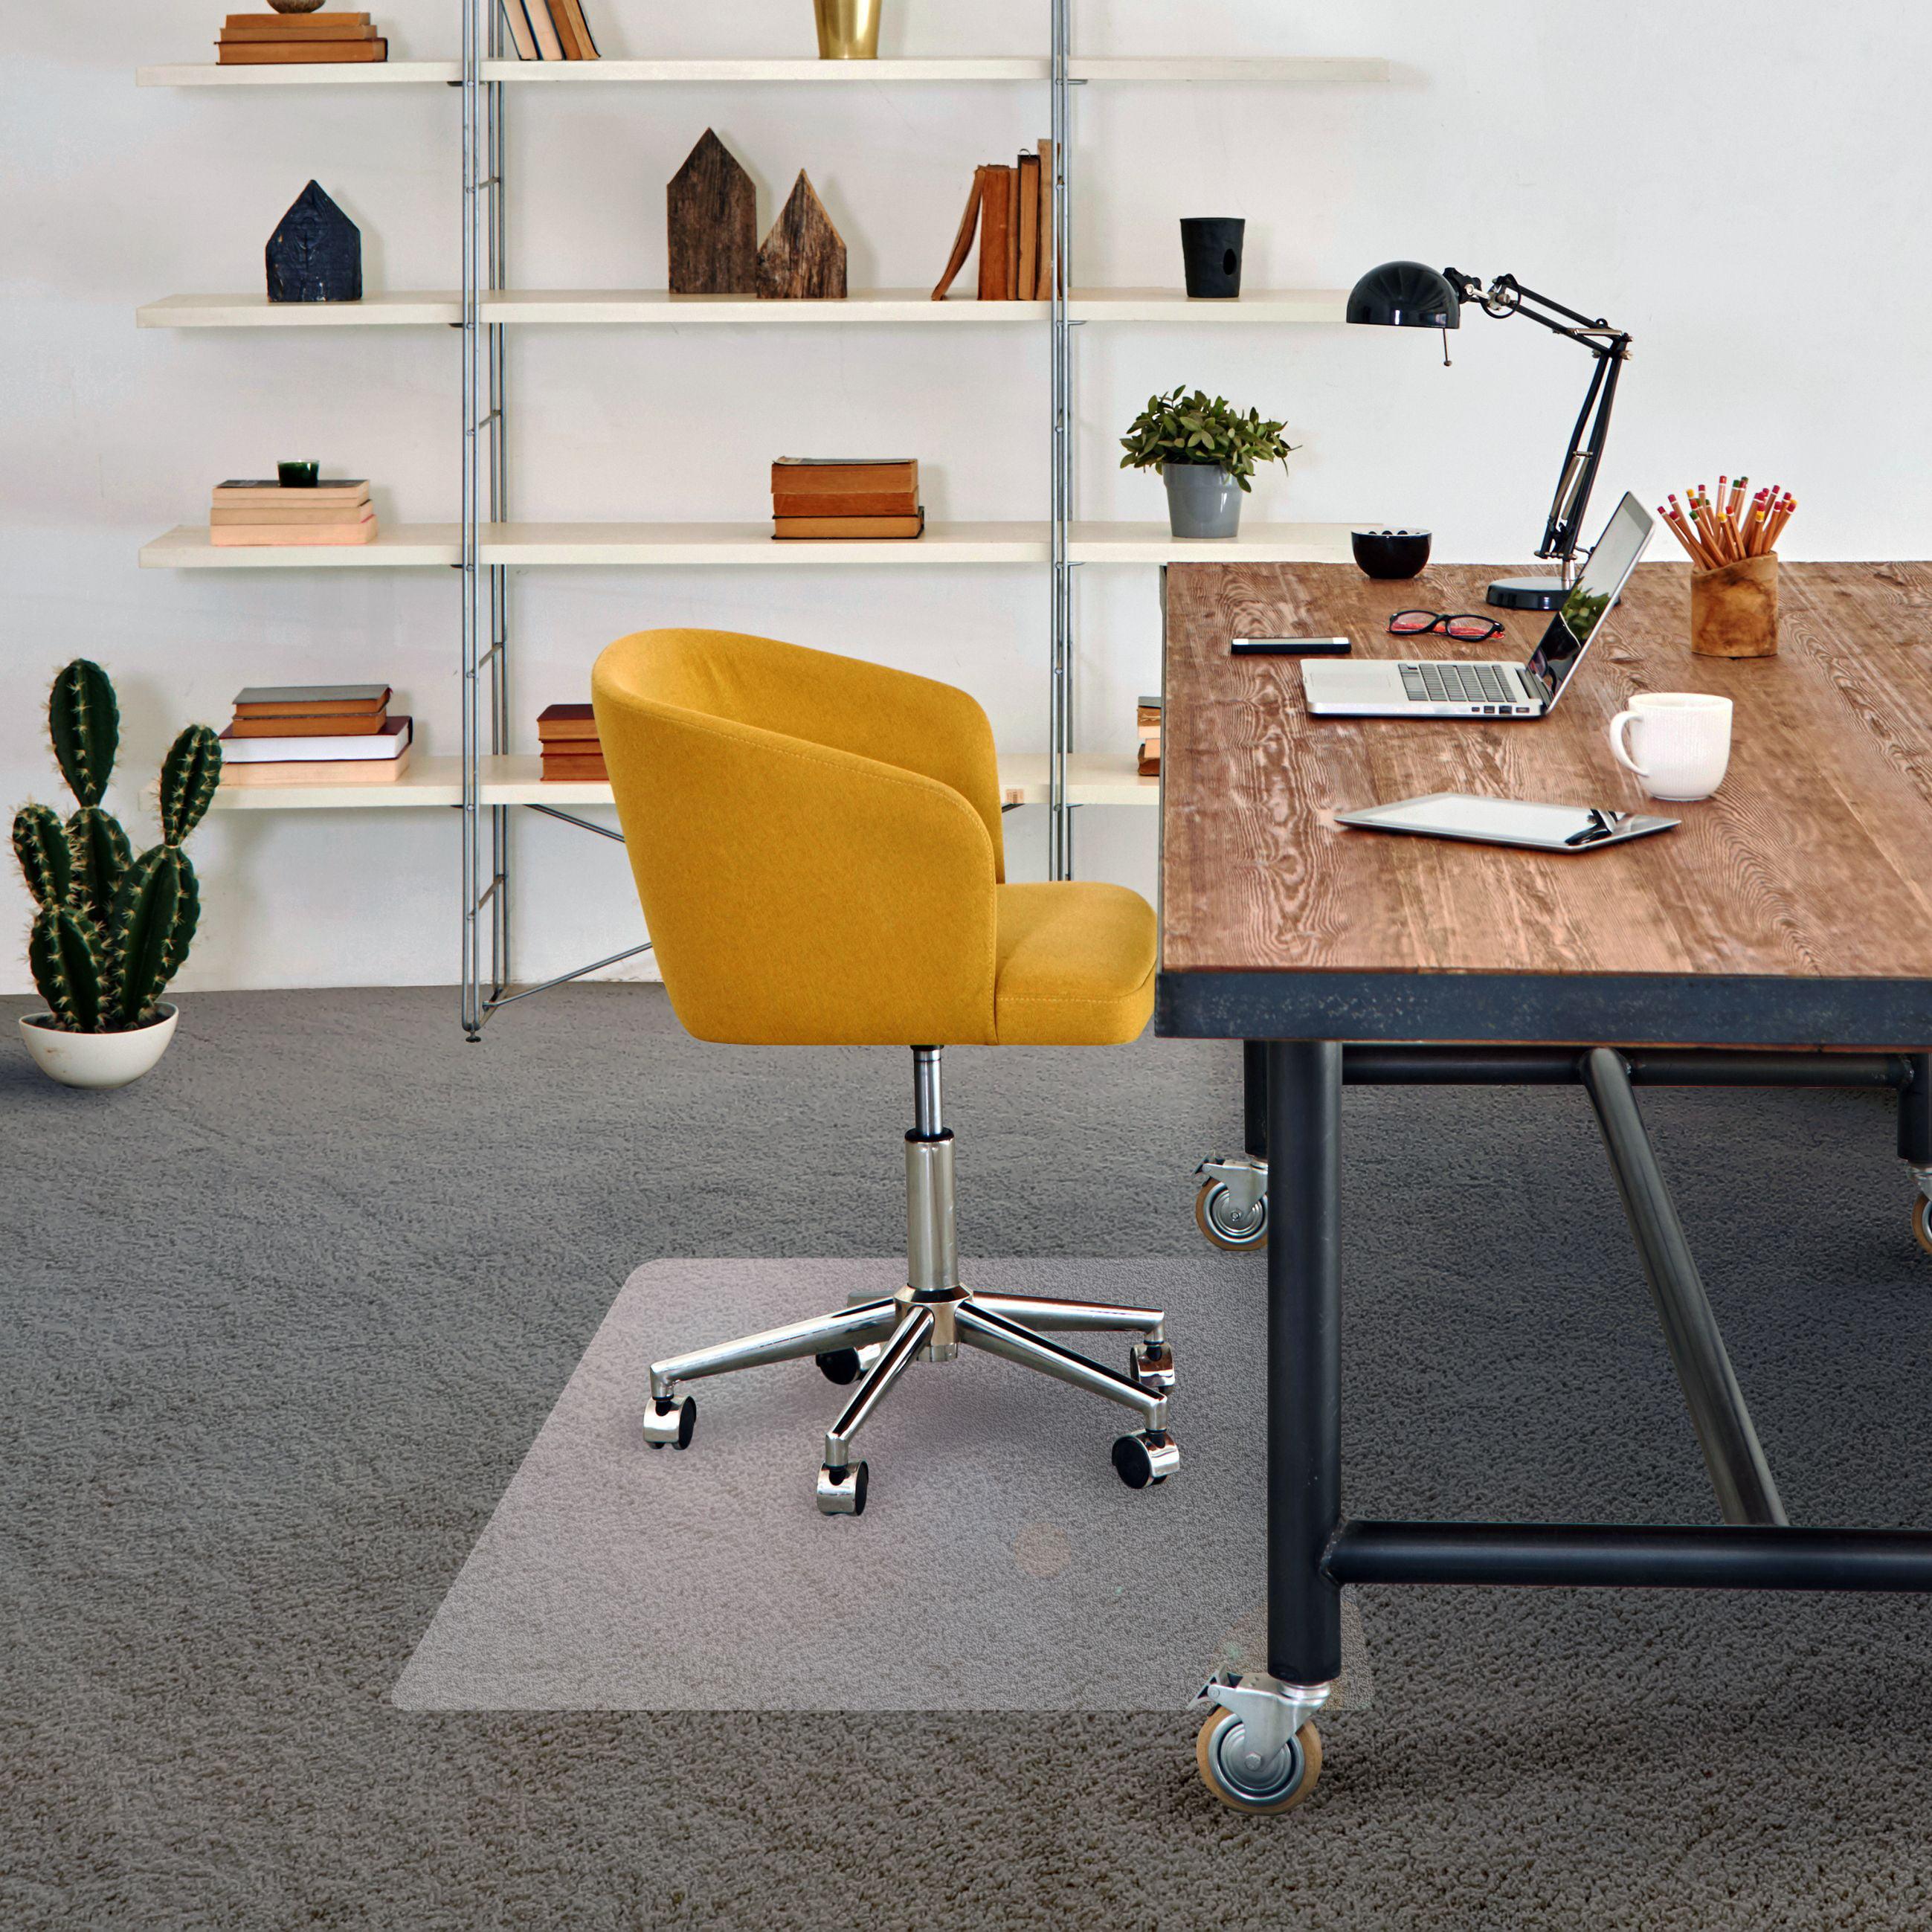 Vinyl Rectangular Chair Mat For Carpets